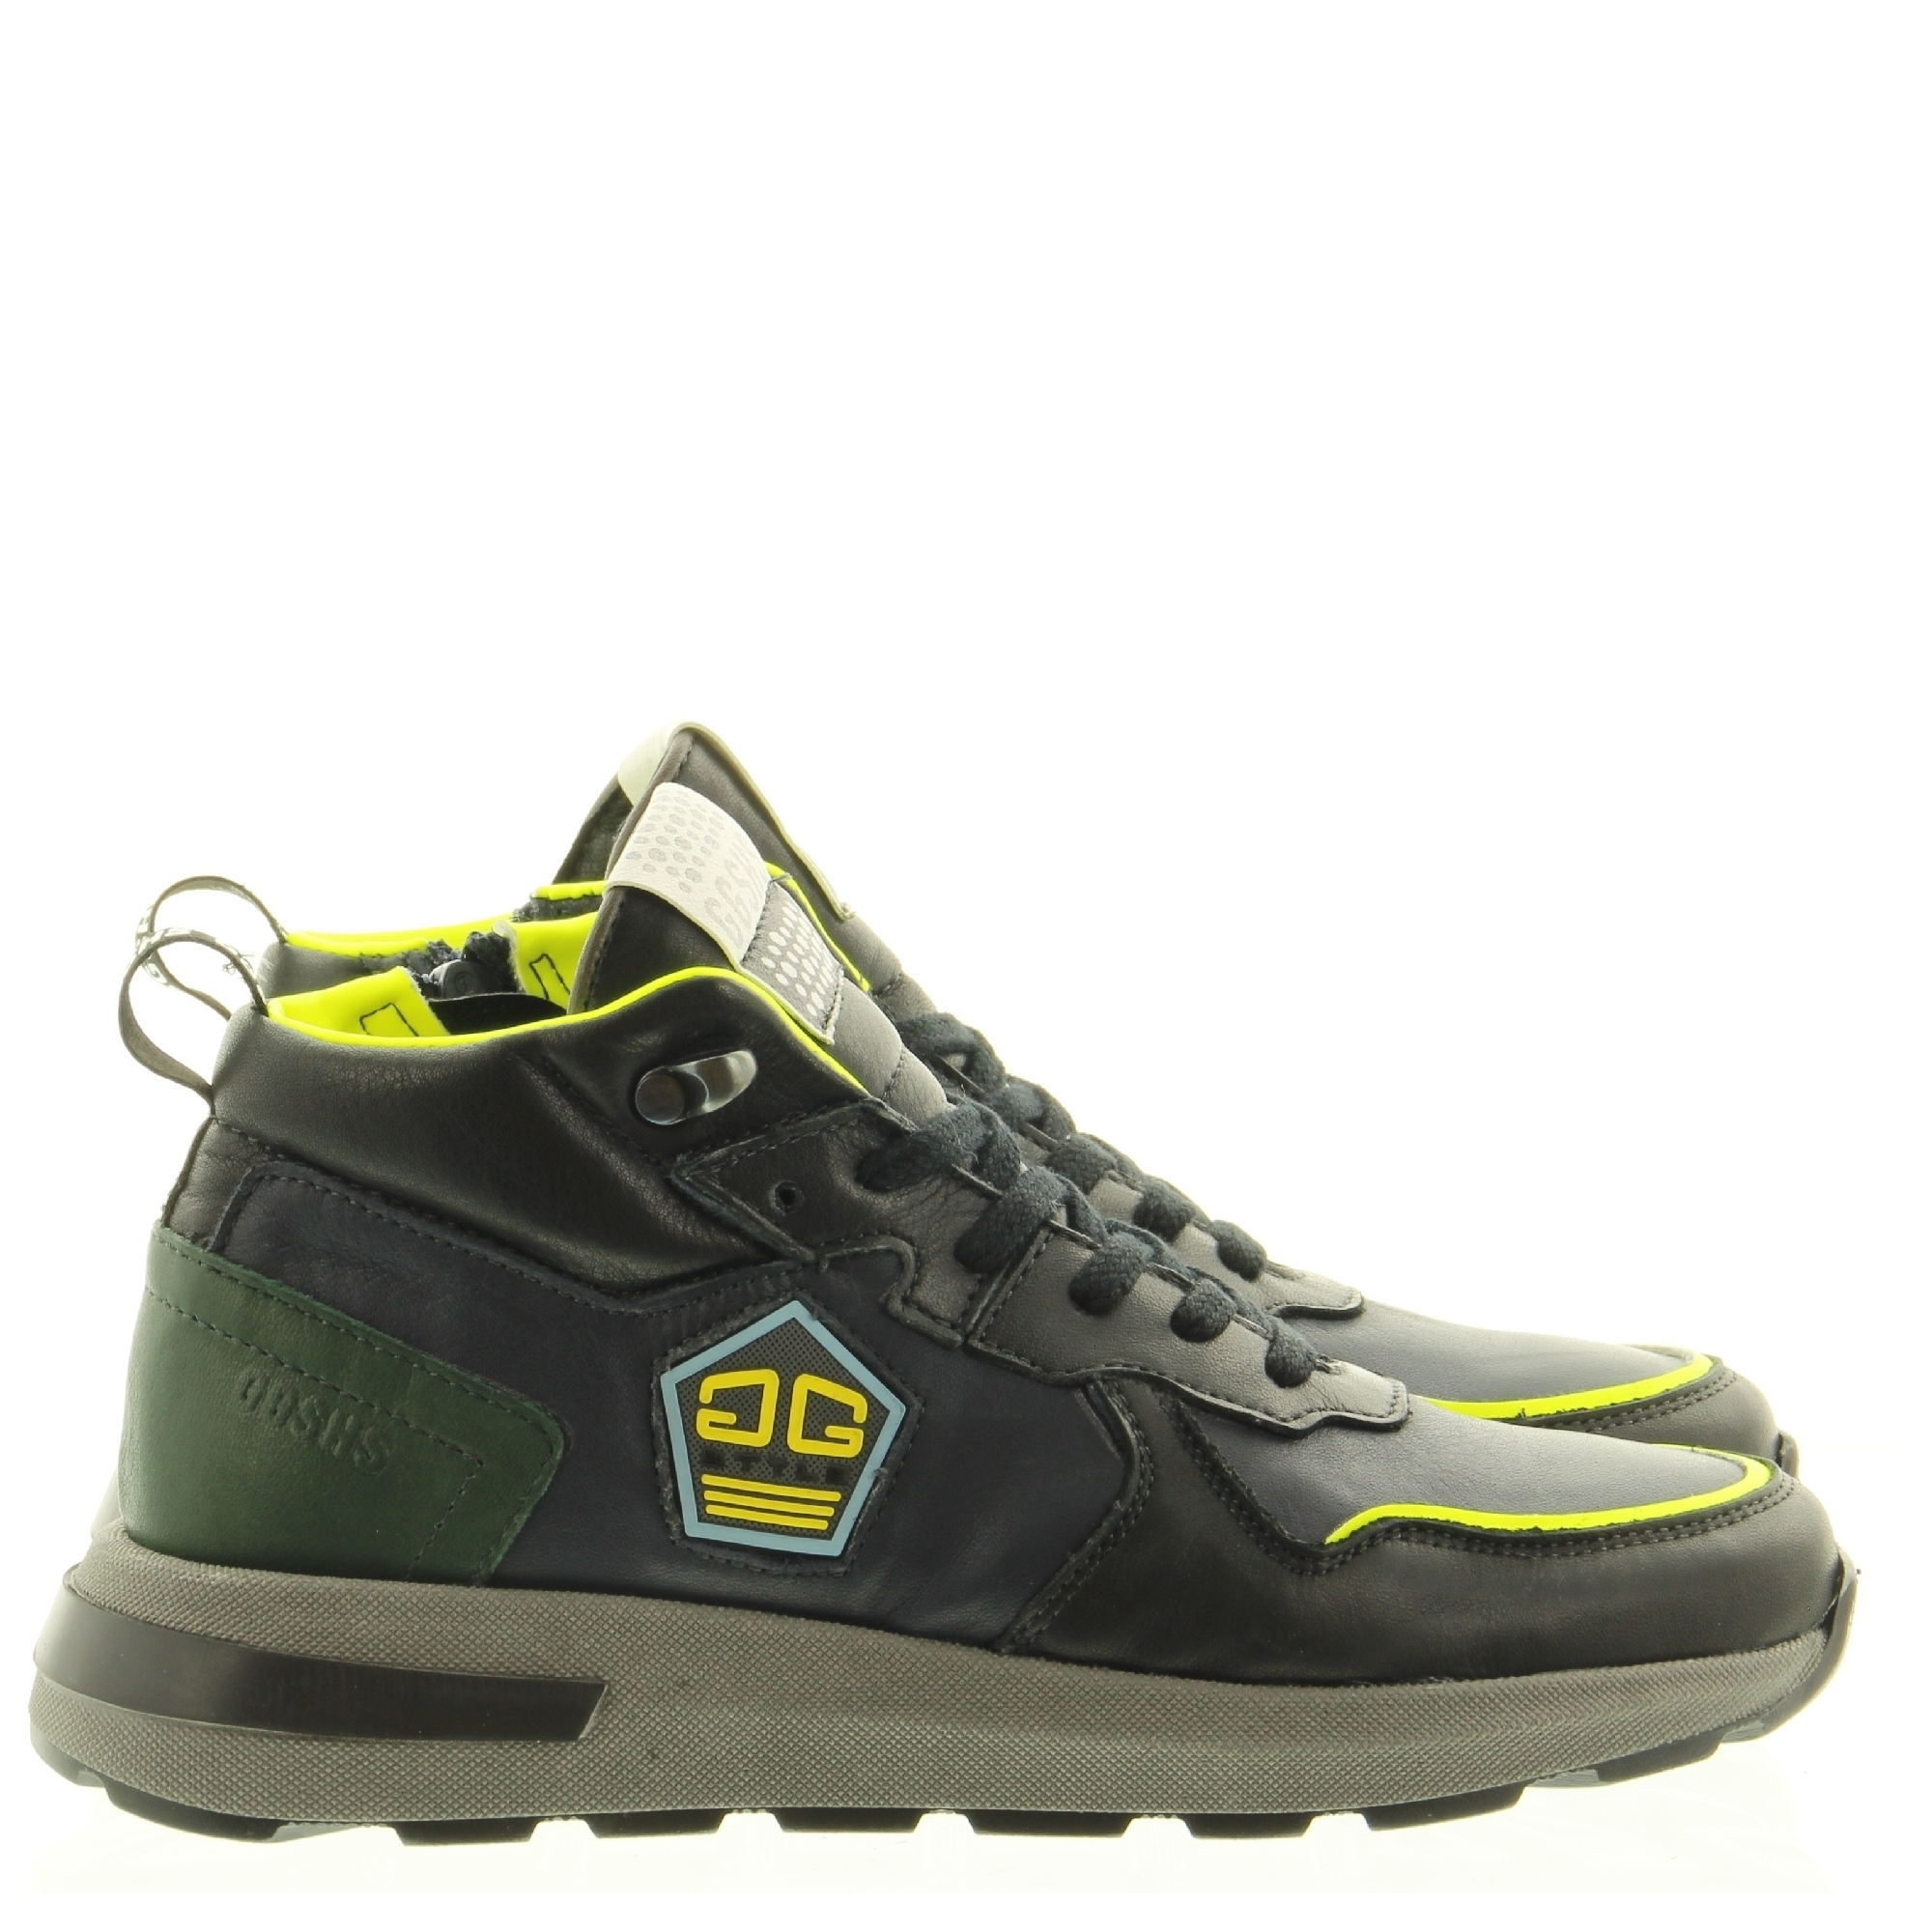 Giga G3575 A11S23 Black Fluor Yellow